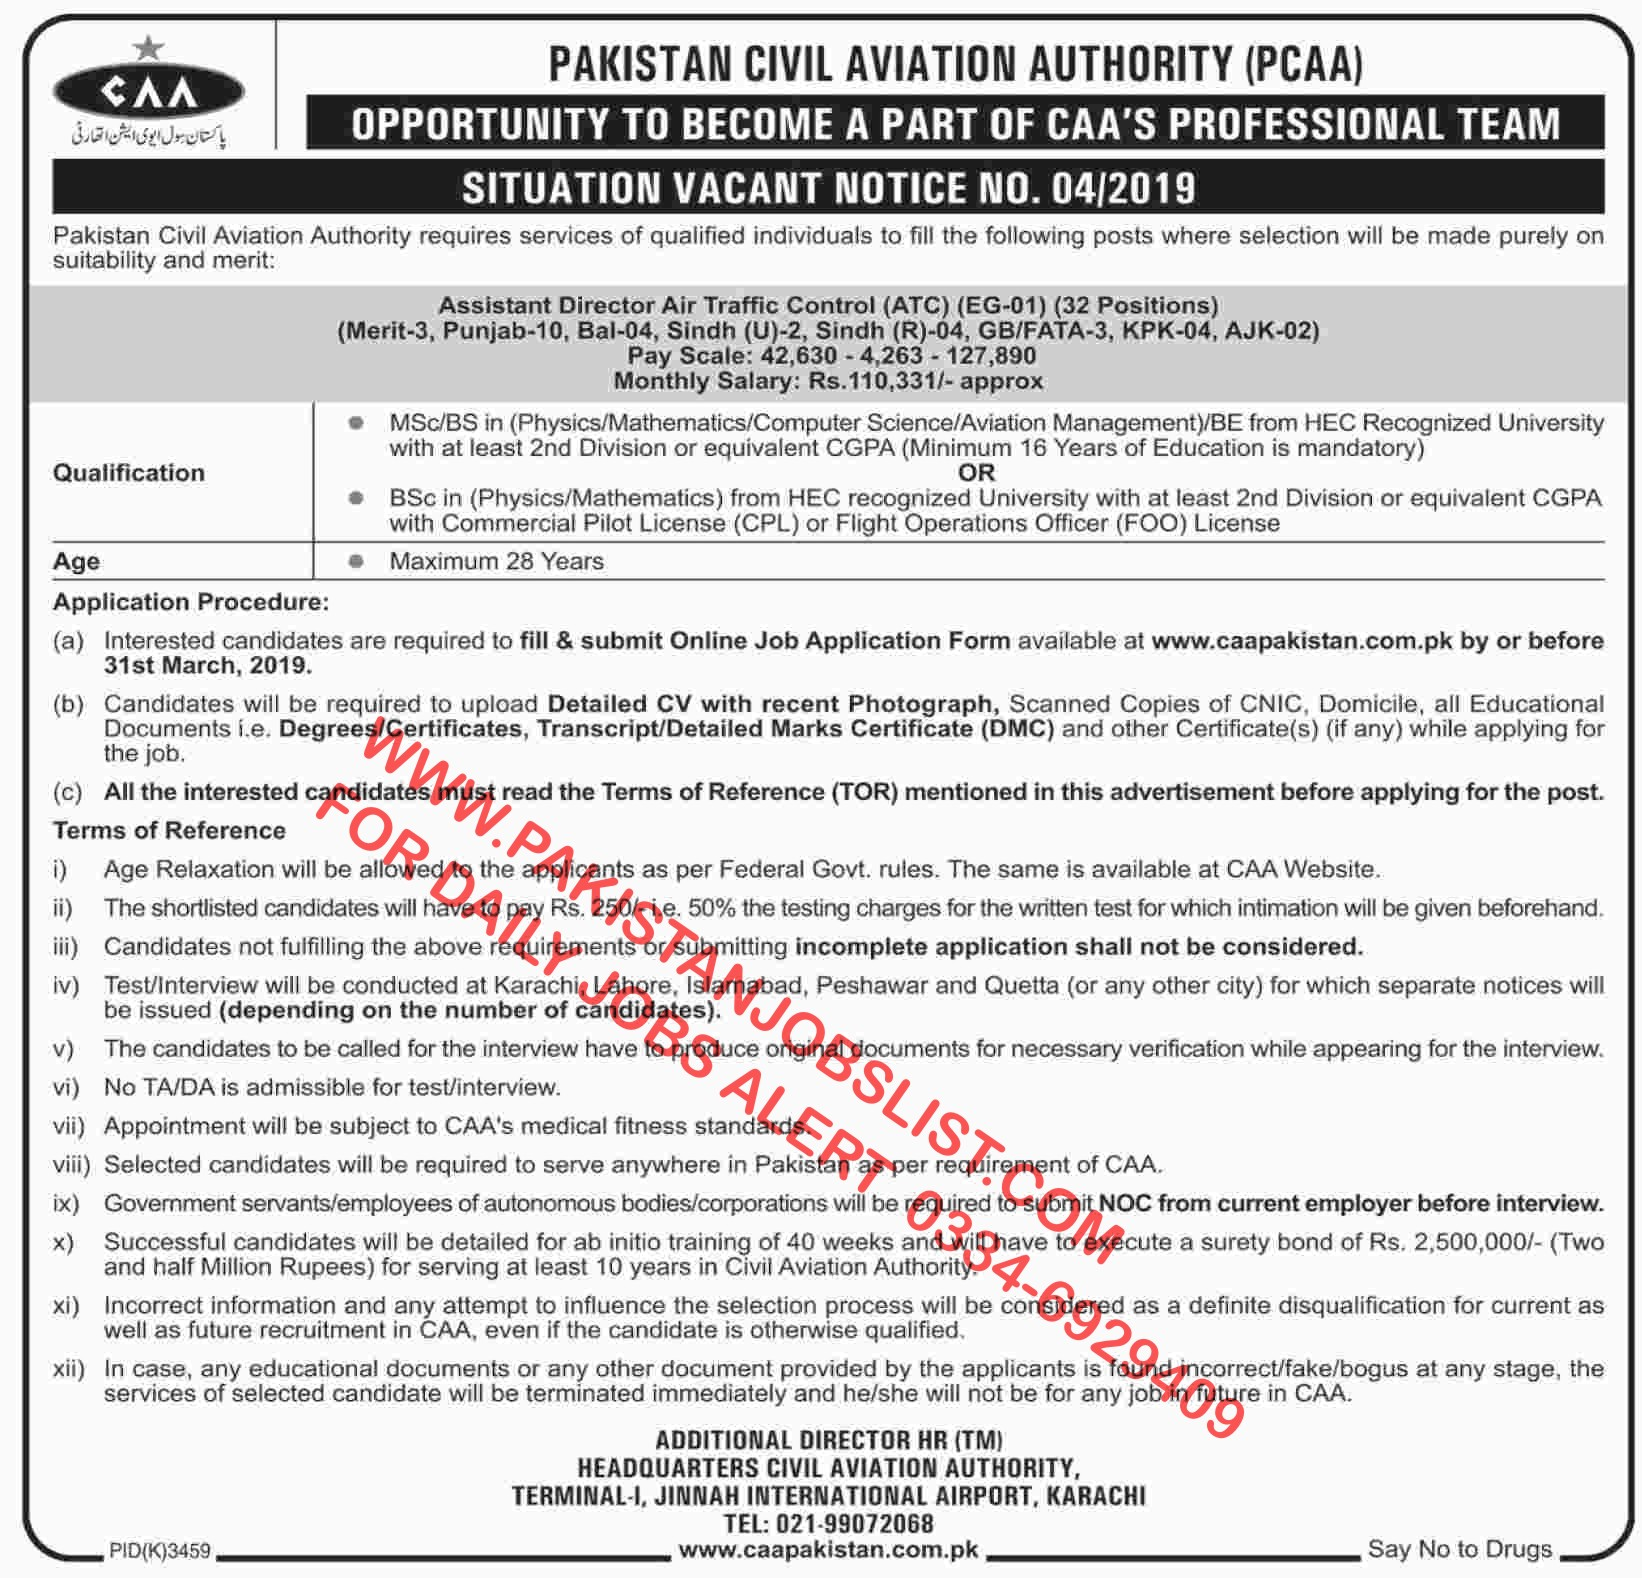 PAKISTAN CIVIL AVIATION AUTHORITY (PCAA) Assistant Director